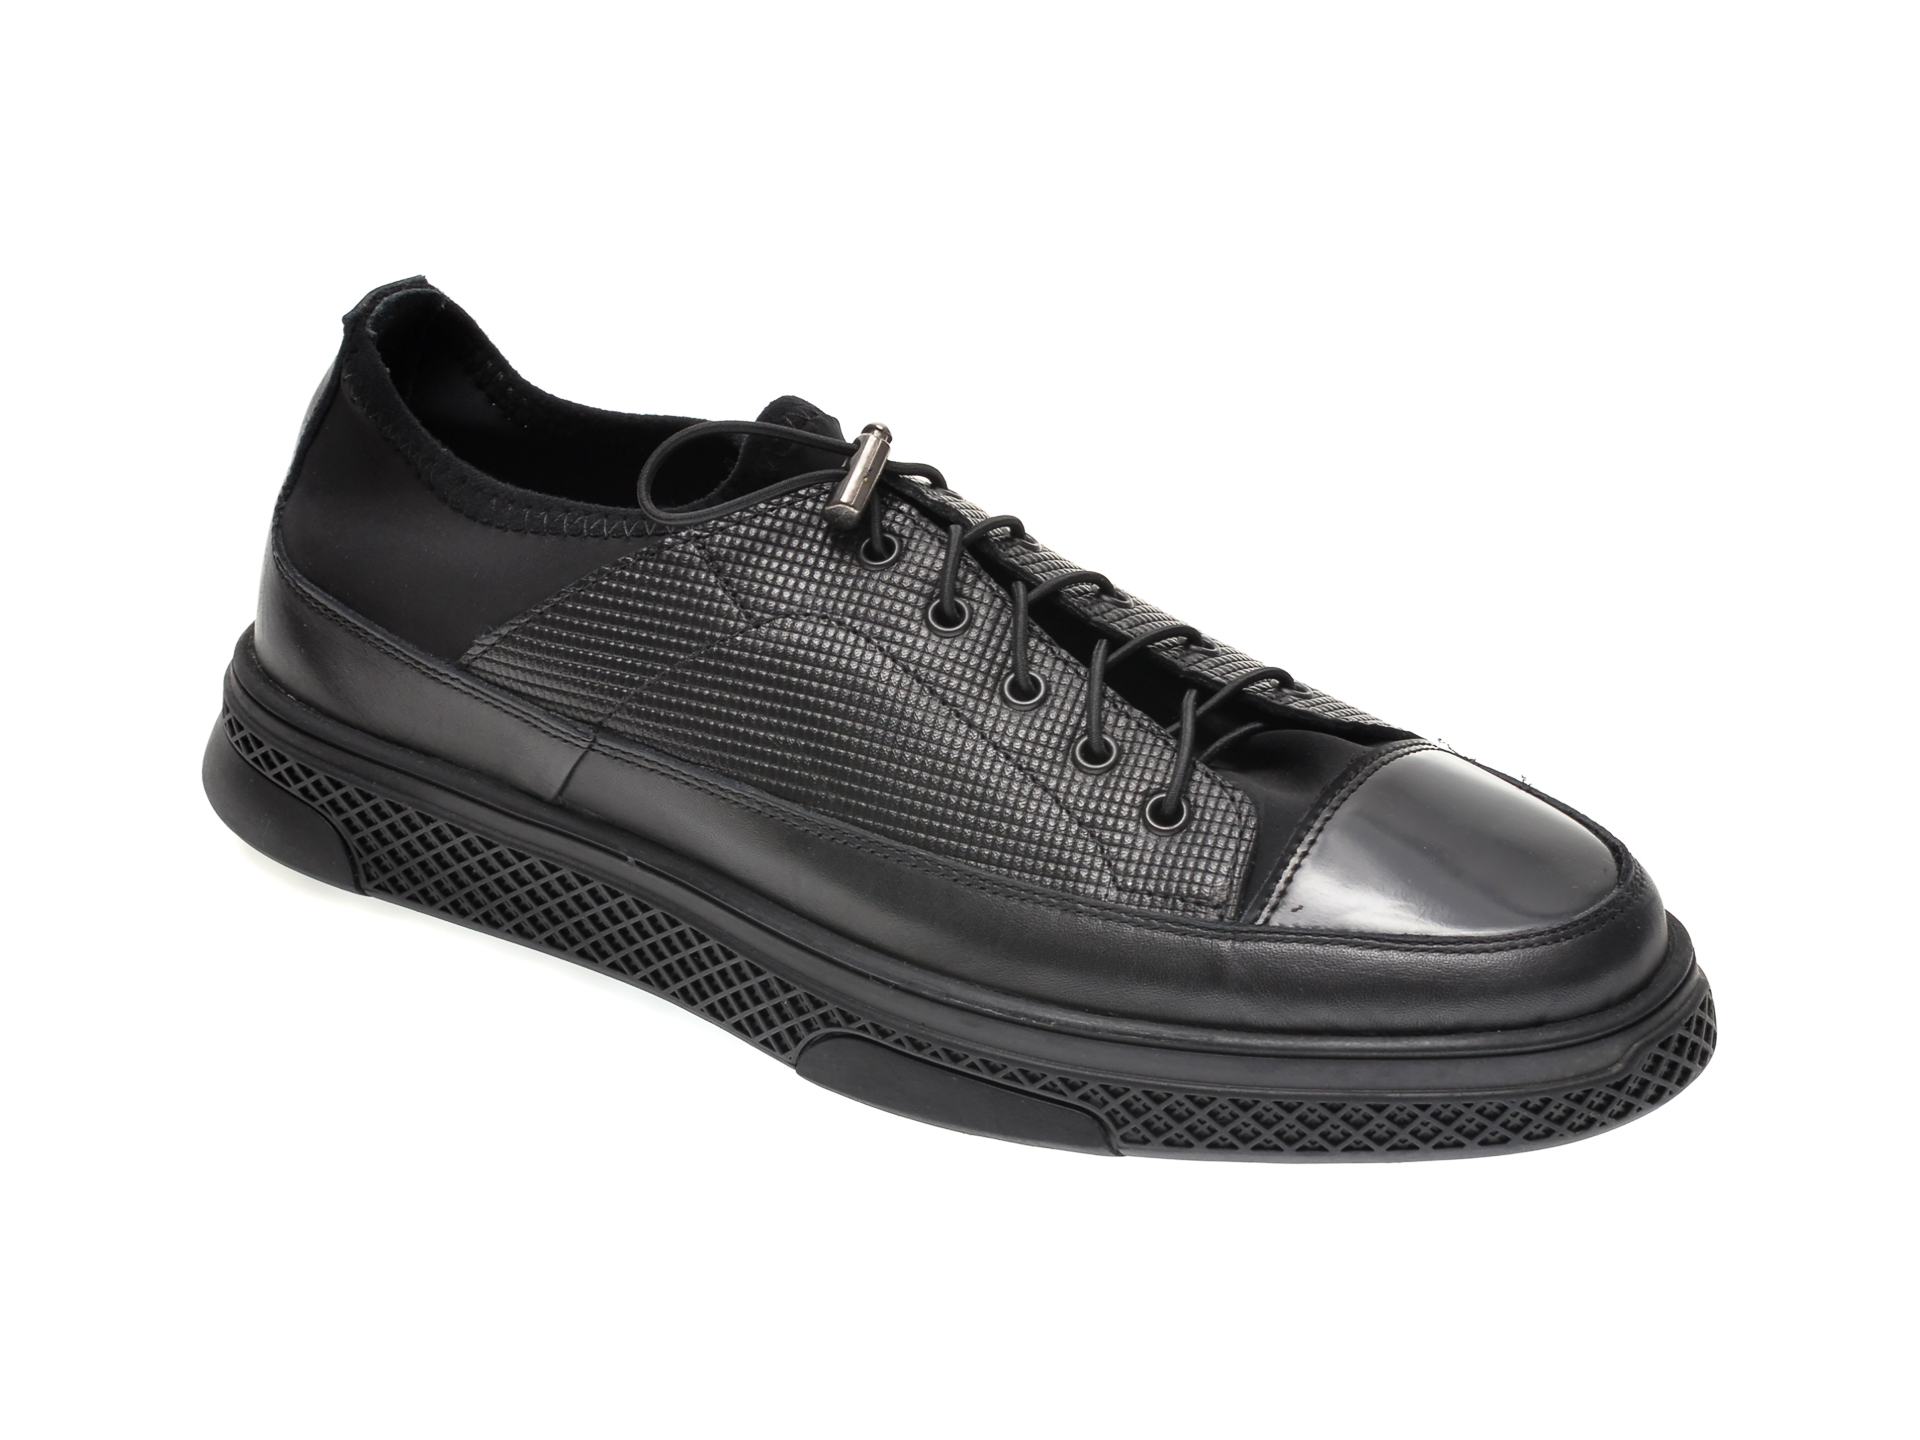 Pantofi OTTER negri, 6666, din material textil si piele naturala imagine